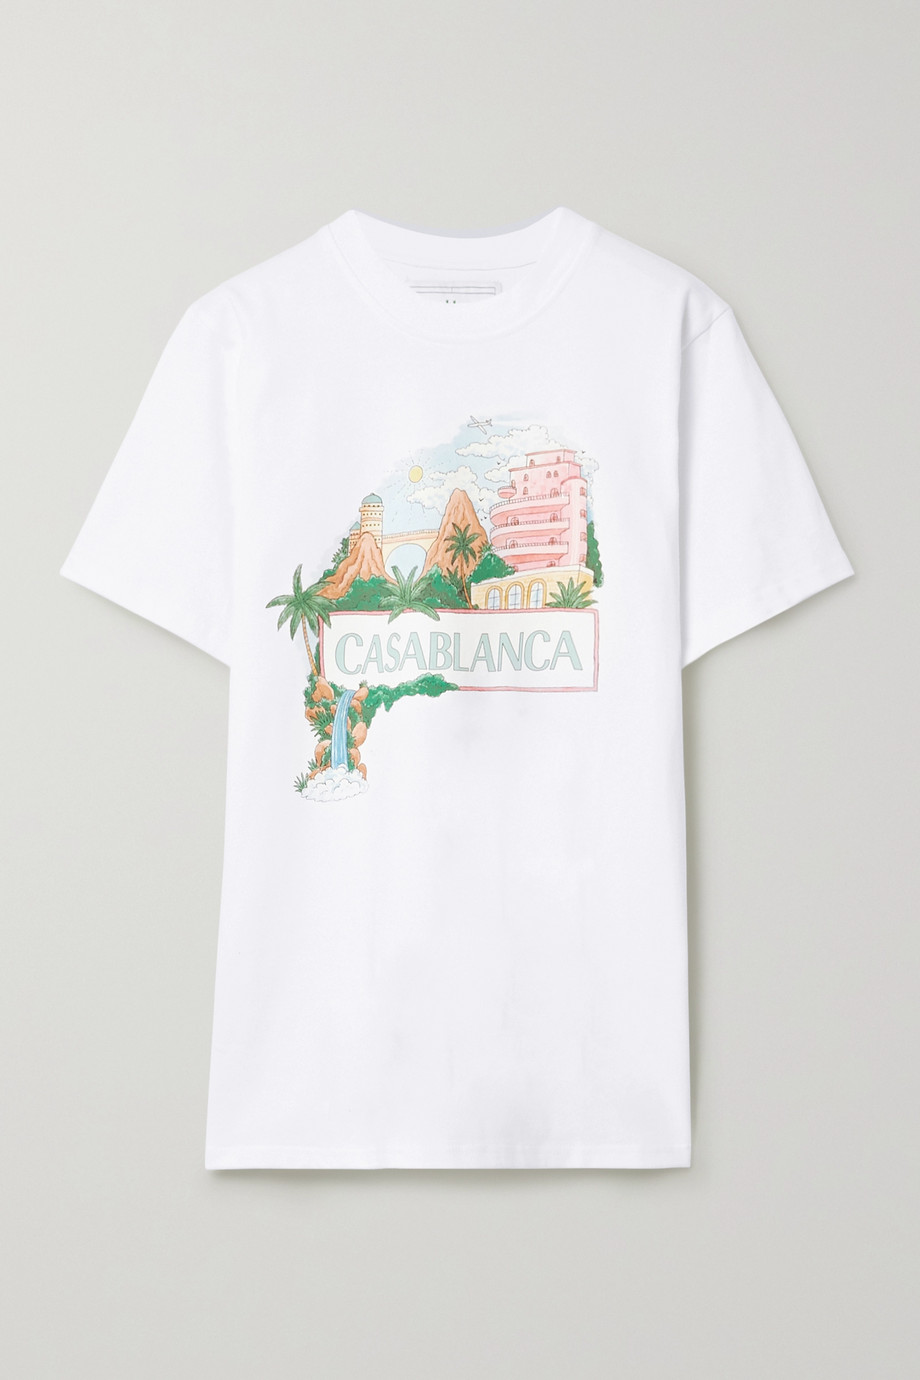 Casablanca Casa Views printed cotton-jersey T-shirt